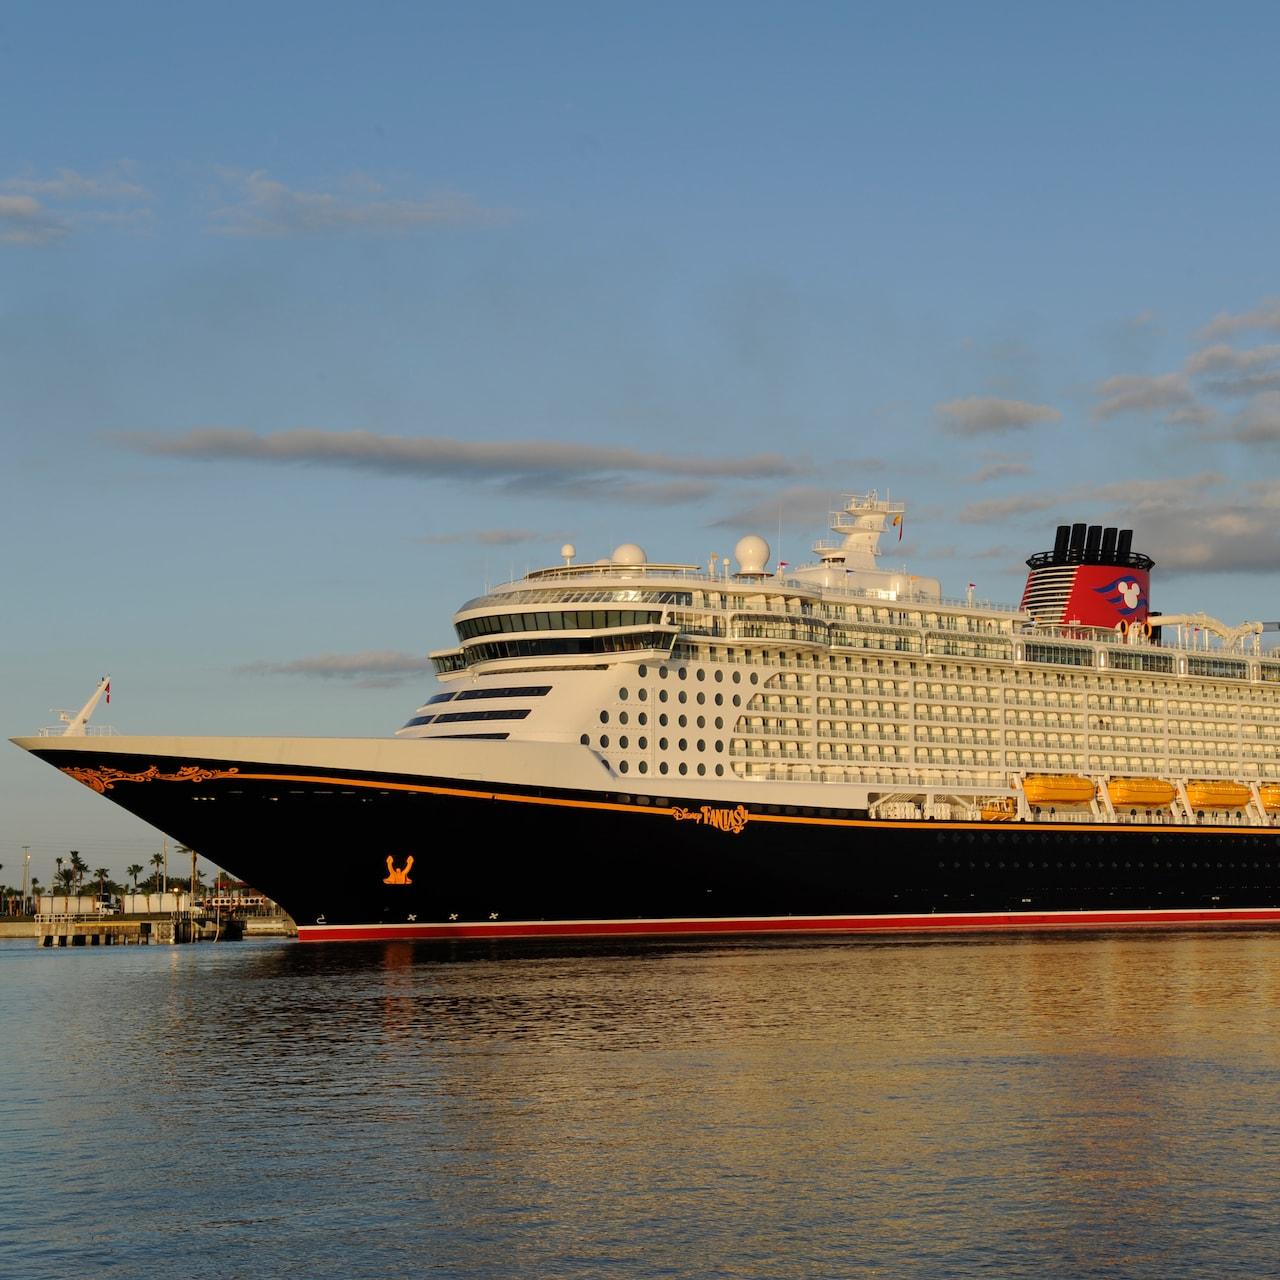 The Disney Cruise Line cruise ship, the Disney Fantasy, sails across the sea